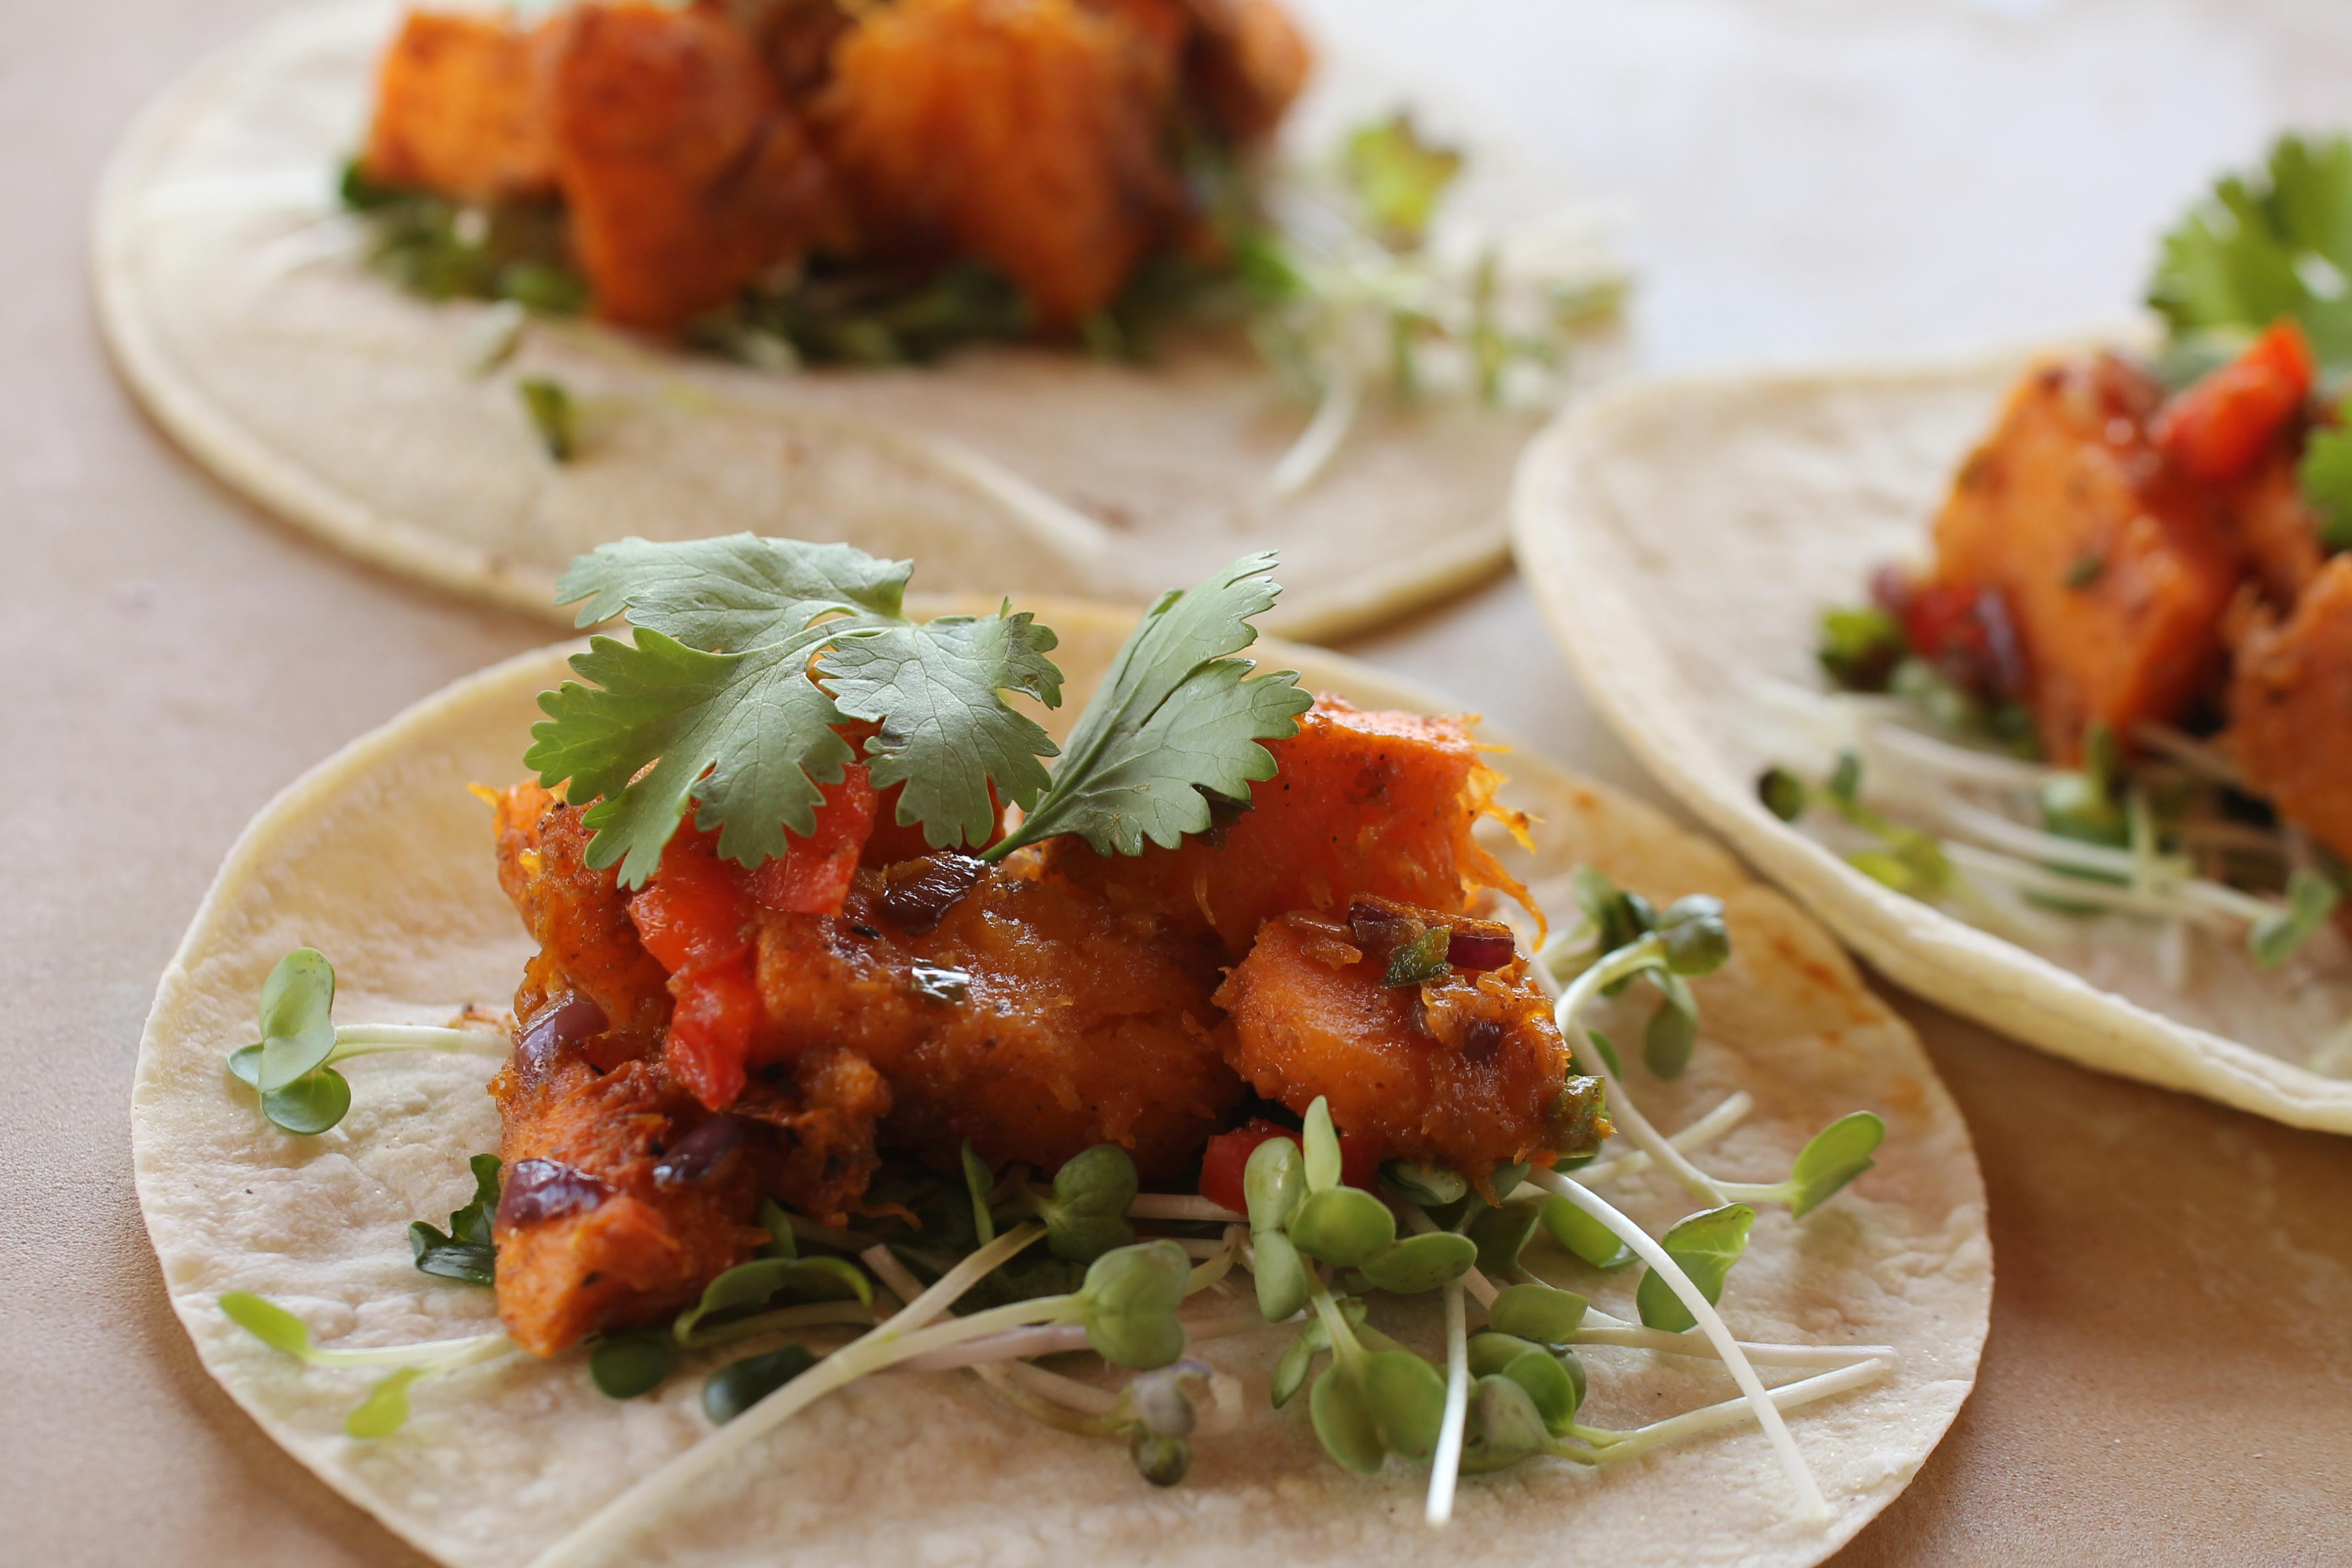 Spiced Butternut Squash Tacos